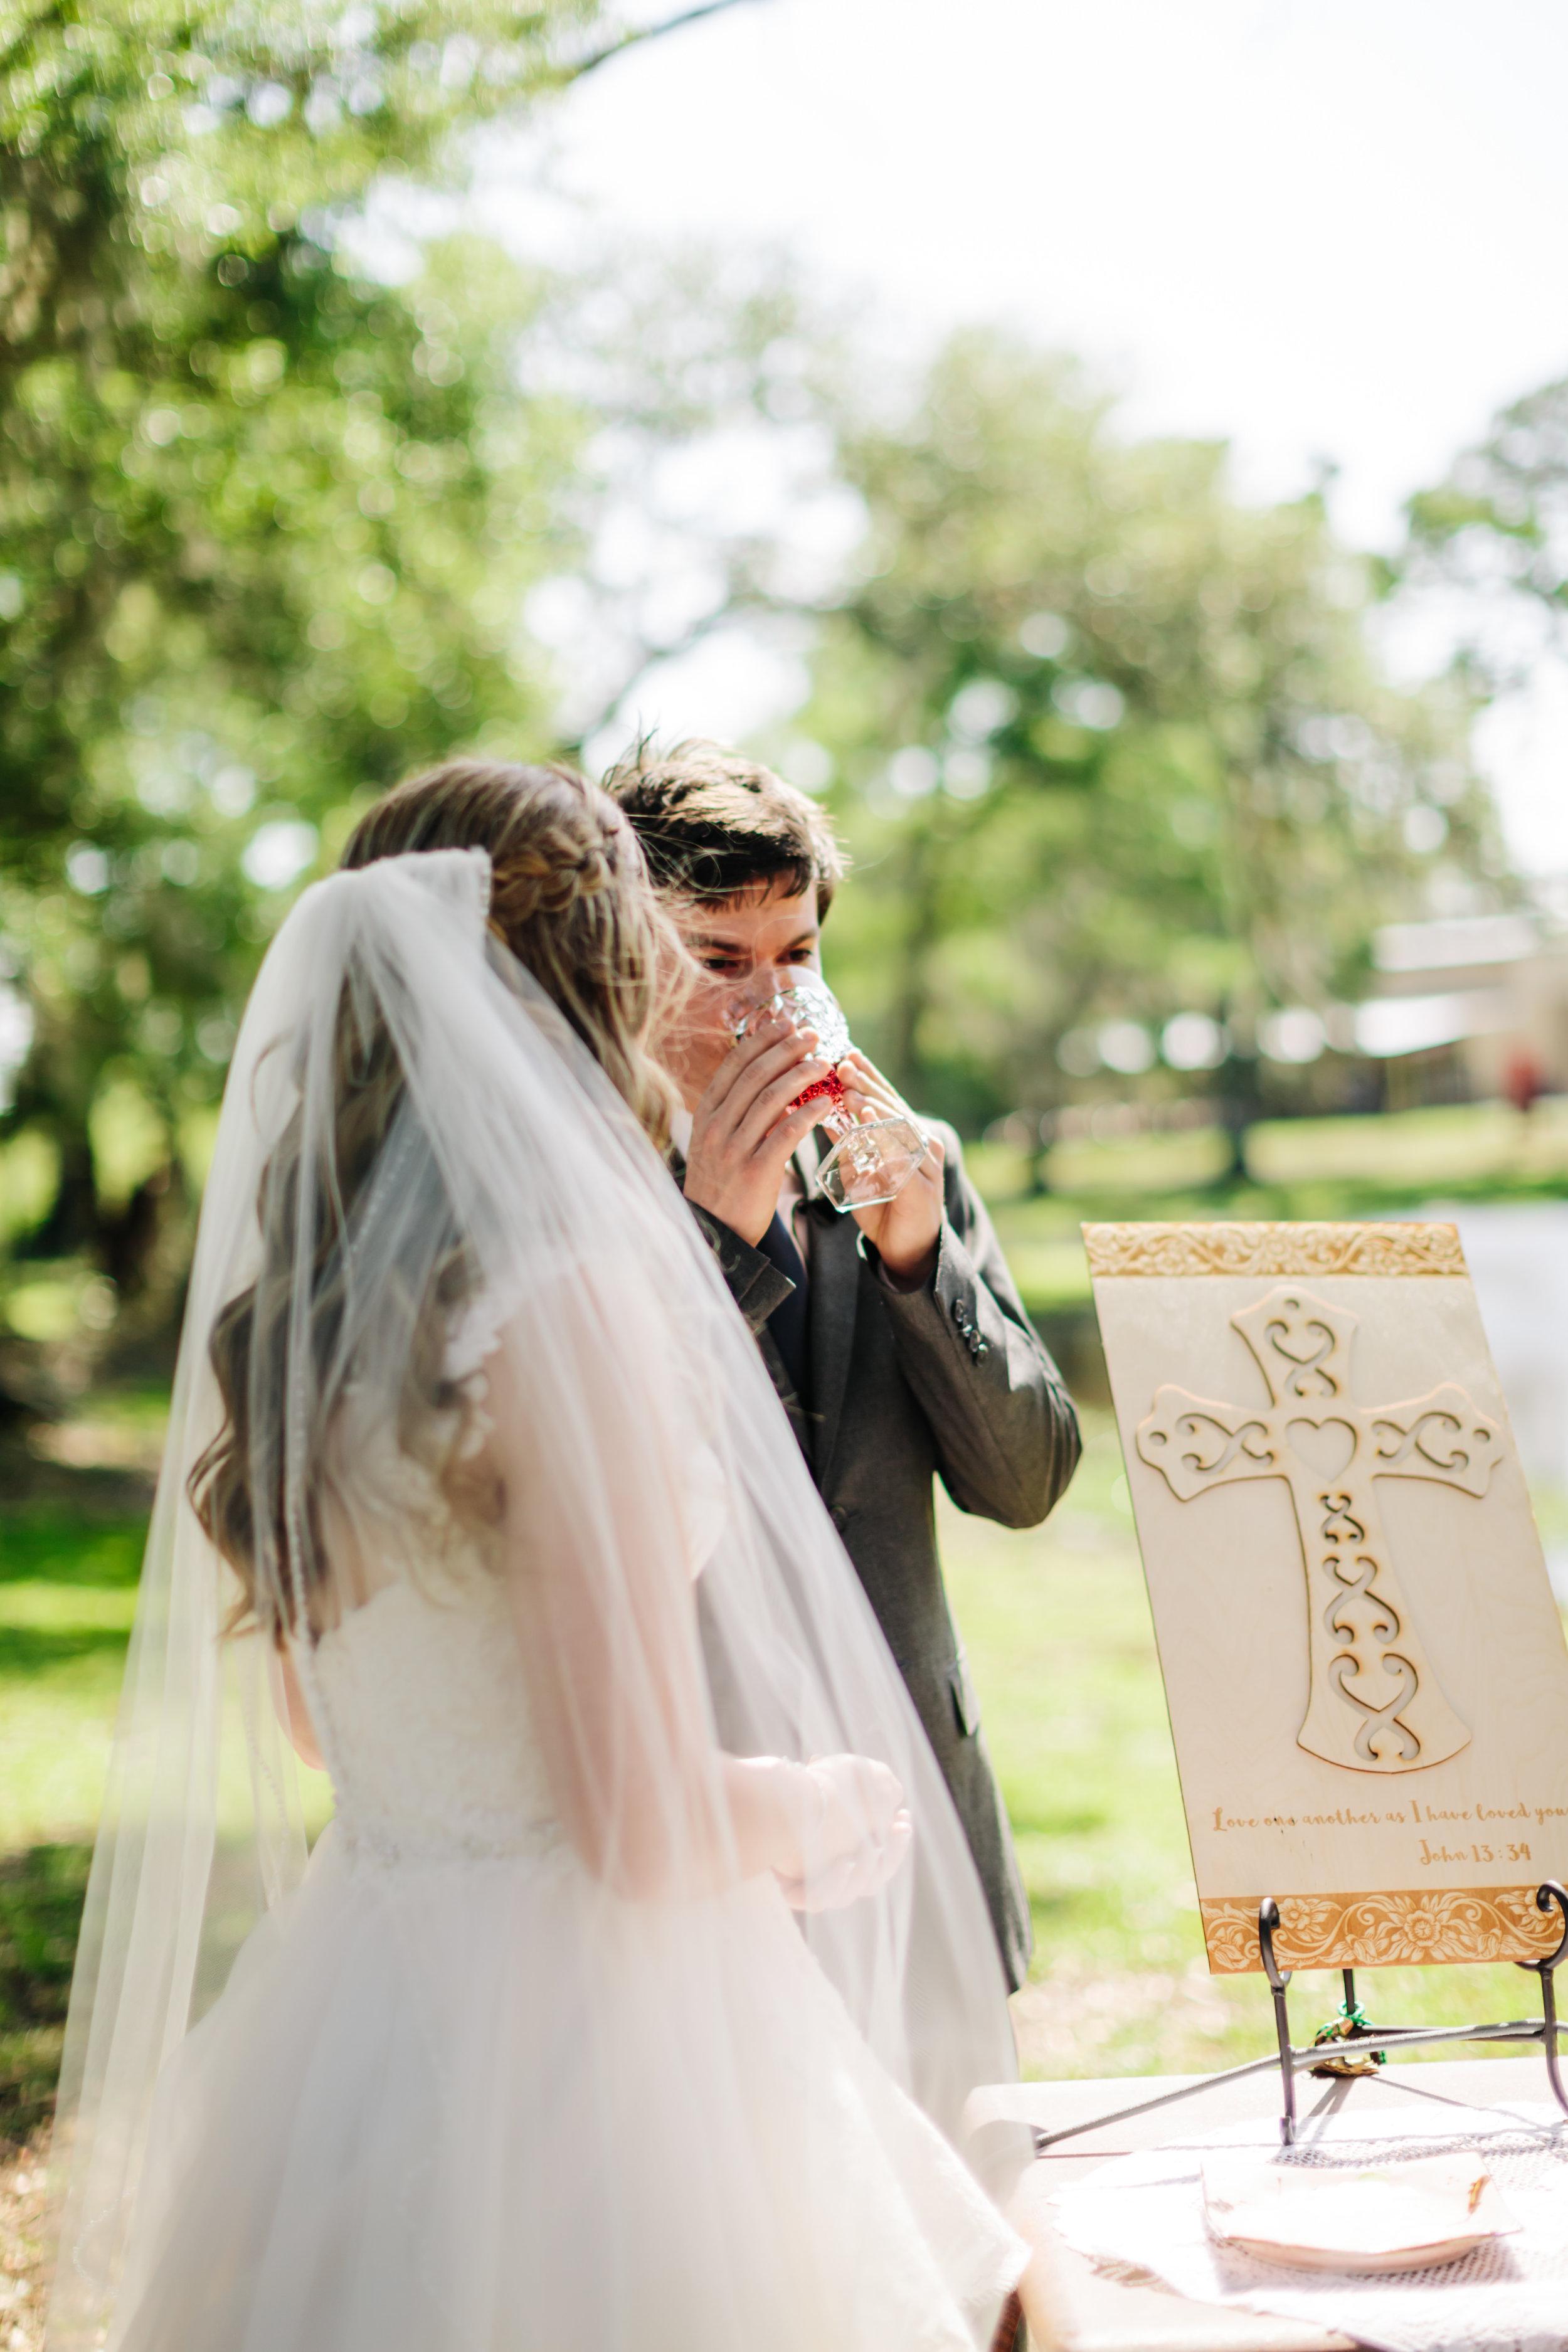 2018.04.14 Zak and Jamisyn Unrue Black Willow Barn Wedding Finals-389.jpg